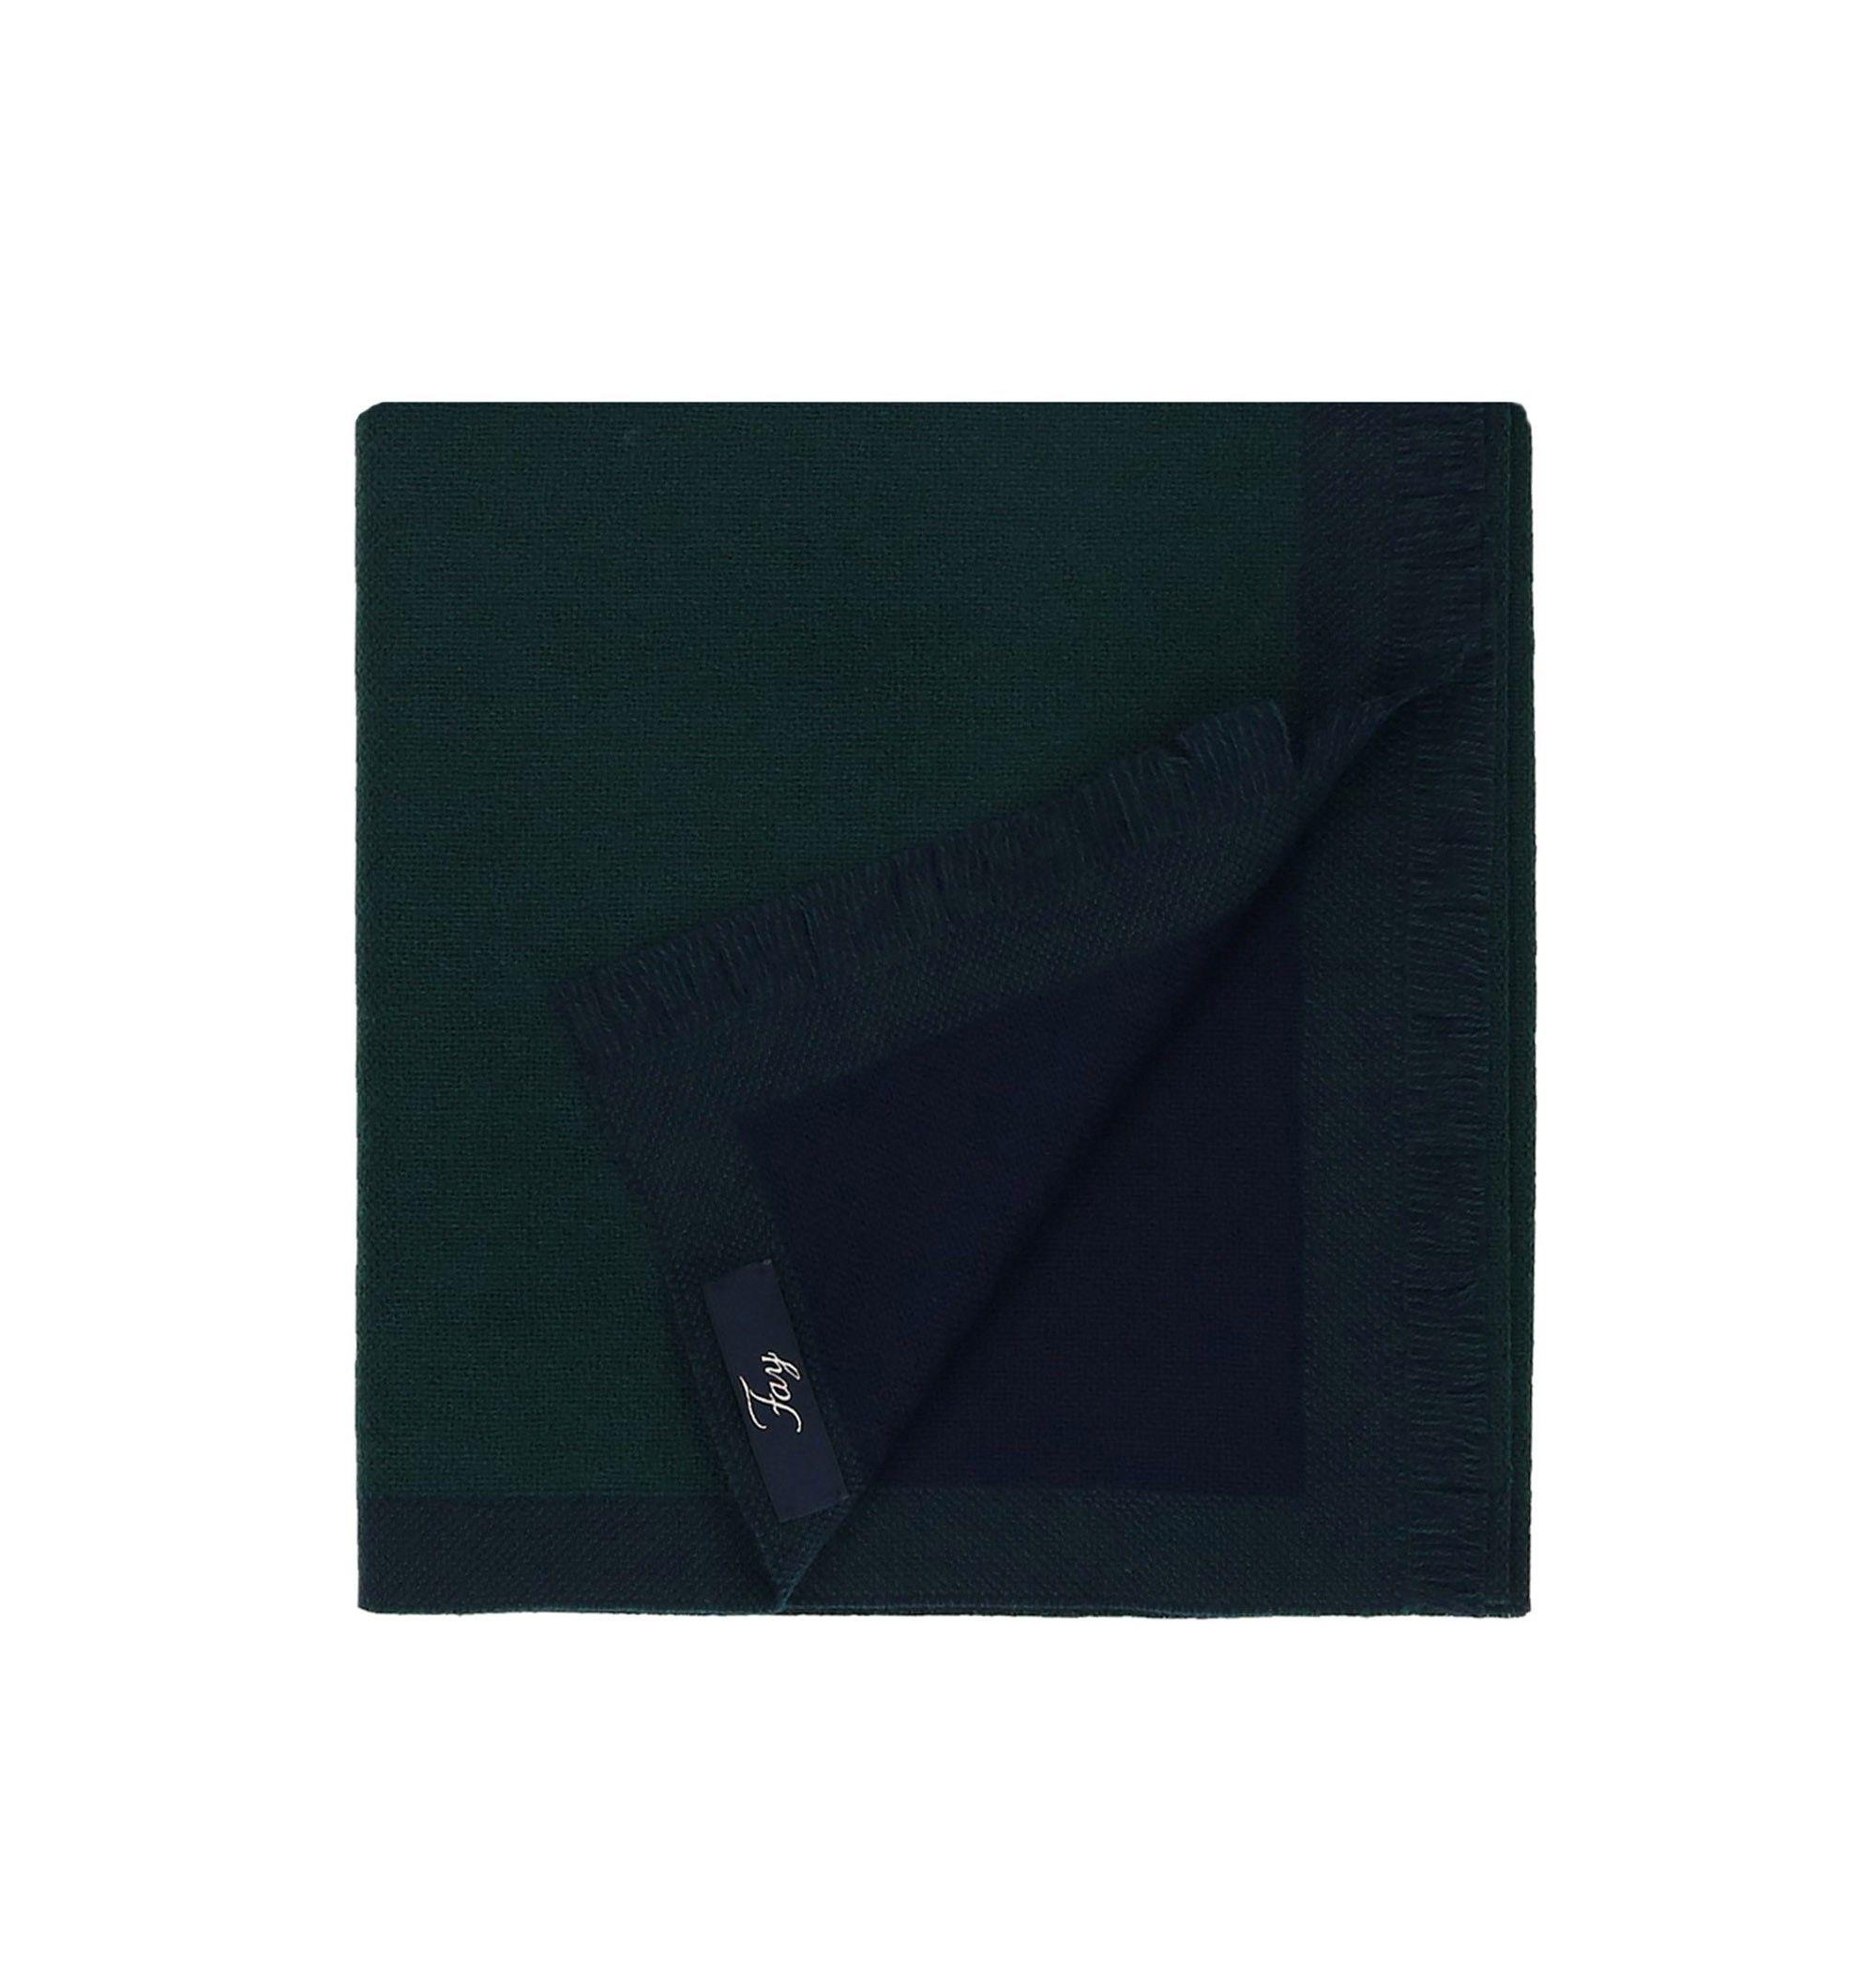 FAY MEN'S NSMF2392960HFR0G57 GREEN WOOL SCARF